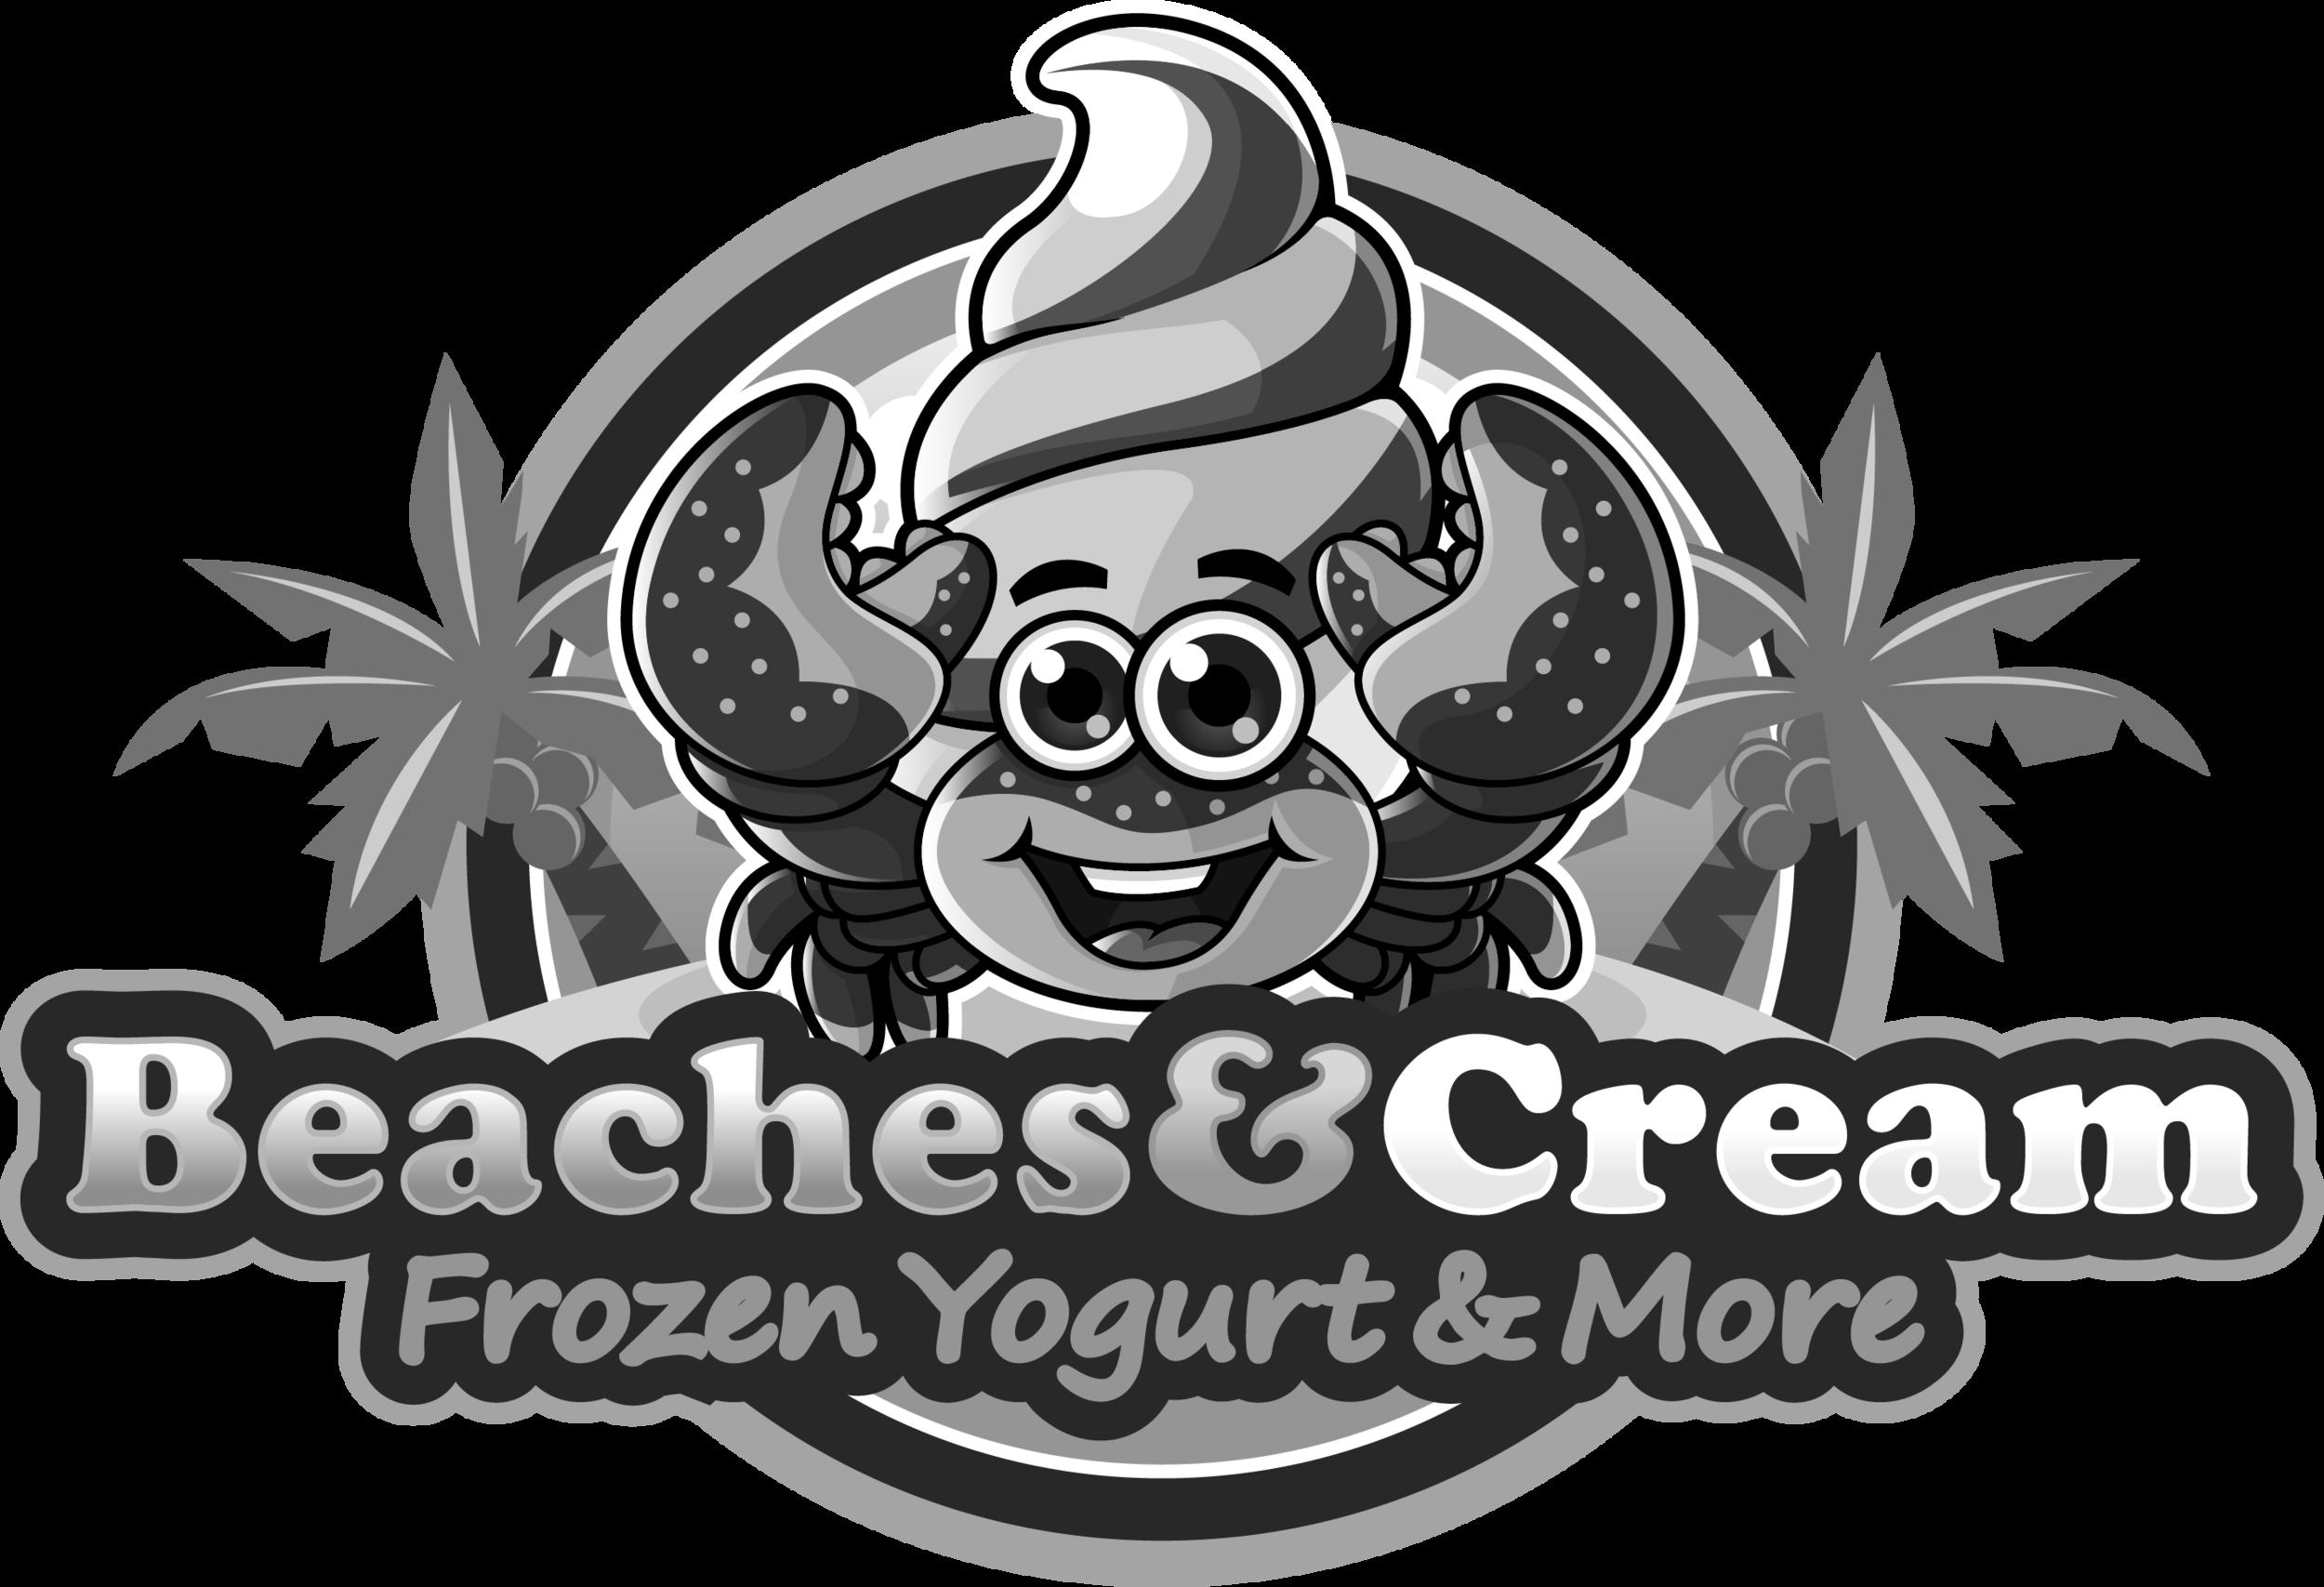 Beaches&Cream Logo.png